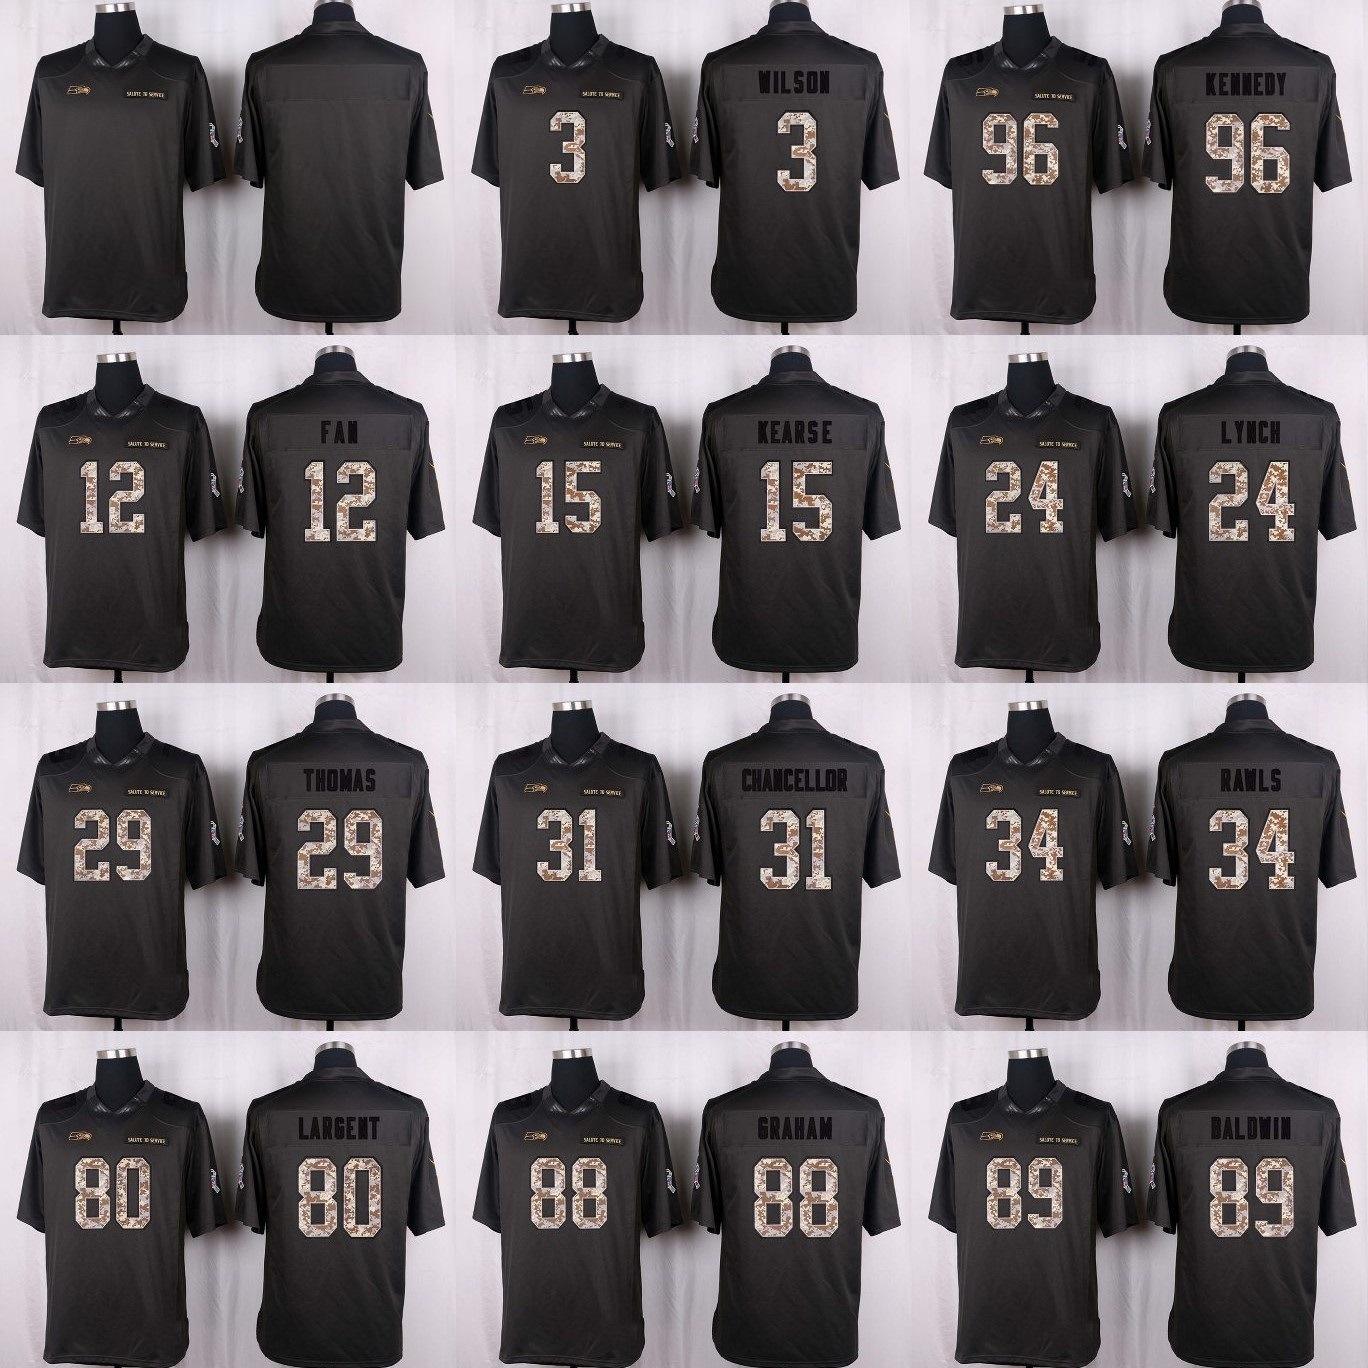 buy online b7c50 312cb [Hot Item] Rees Odhiambo Skyler Phillips George Fant Seattle Football  Jerseys